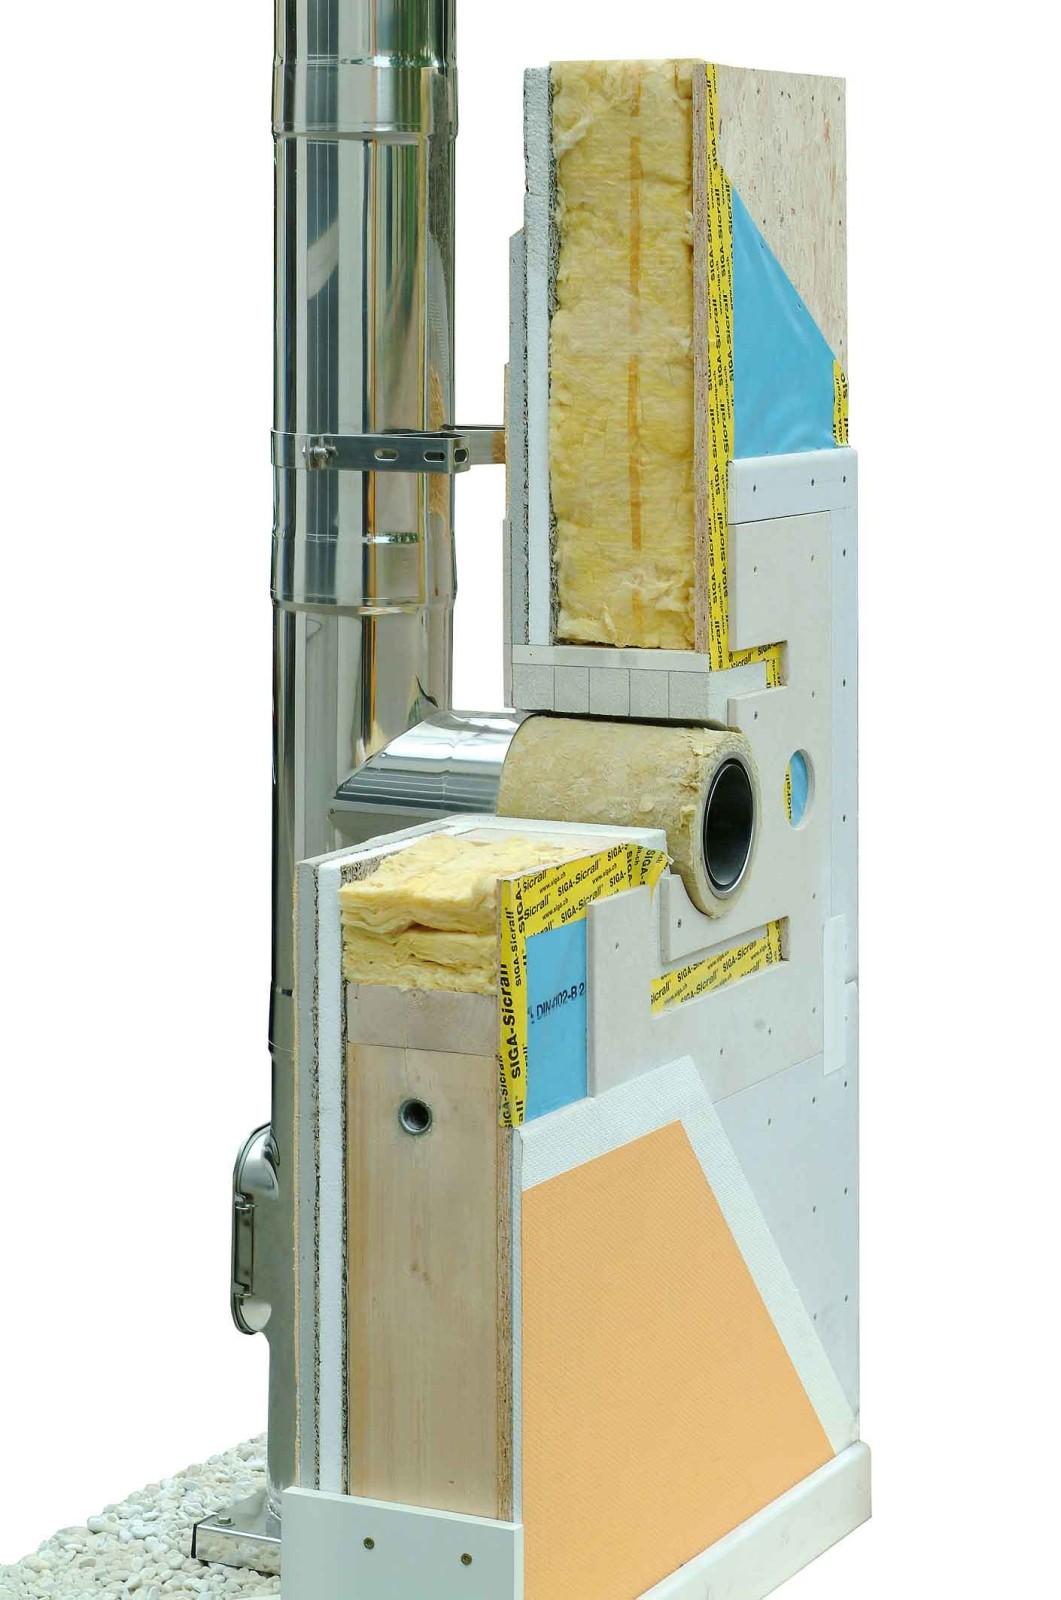 wanddurchf hrung raab bis 120 mm wandst rke rauchfang fachhandel. Black Bedroom Furniture Sets. Home Design Ideas